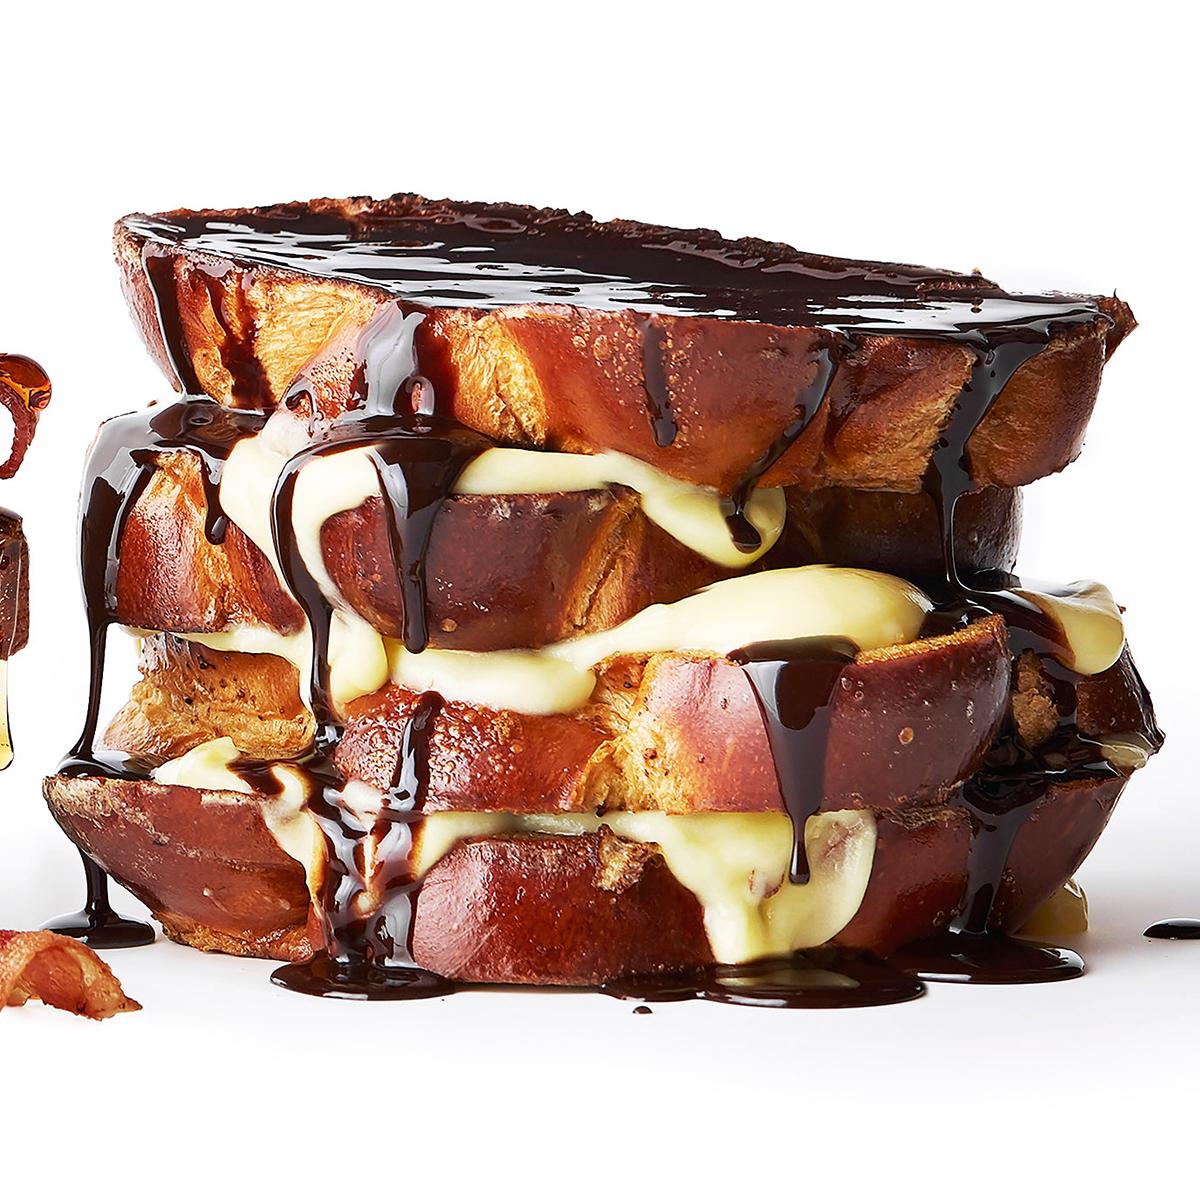 boston cream pie french toast